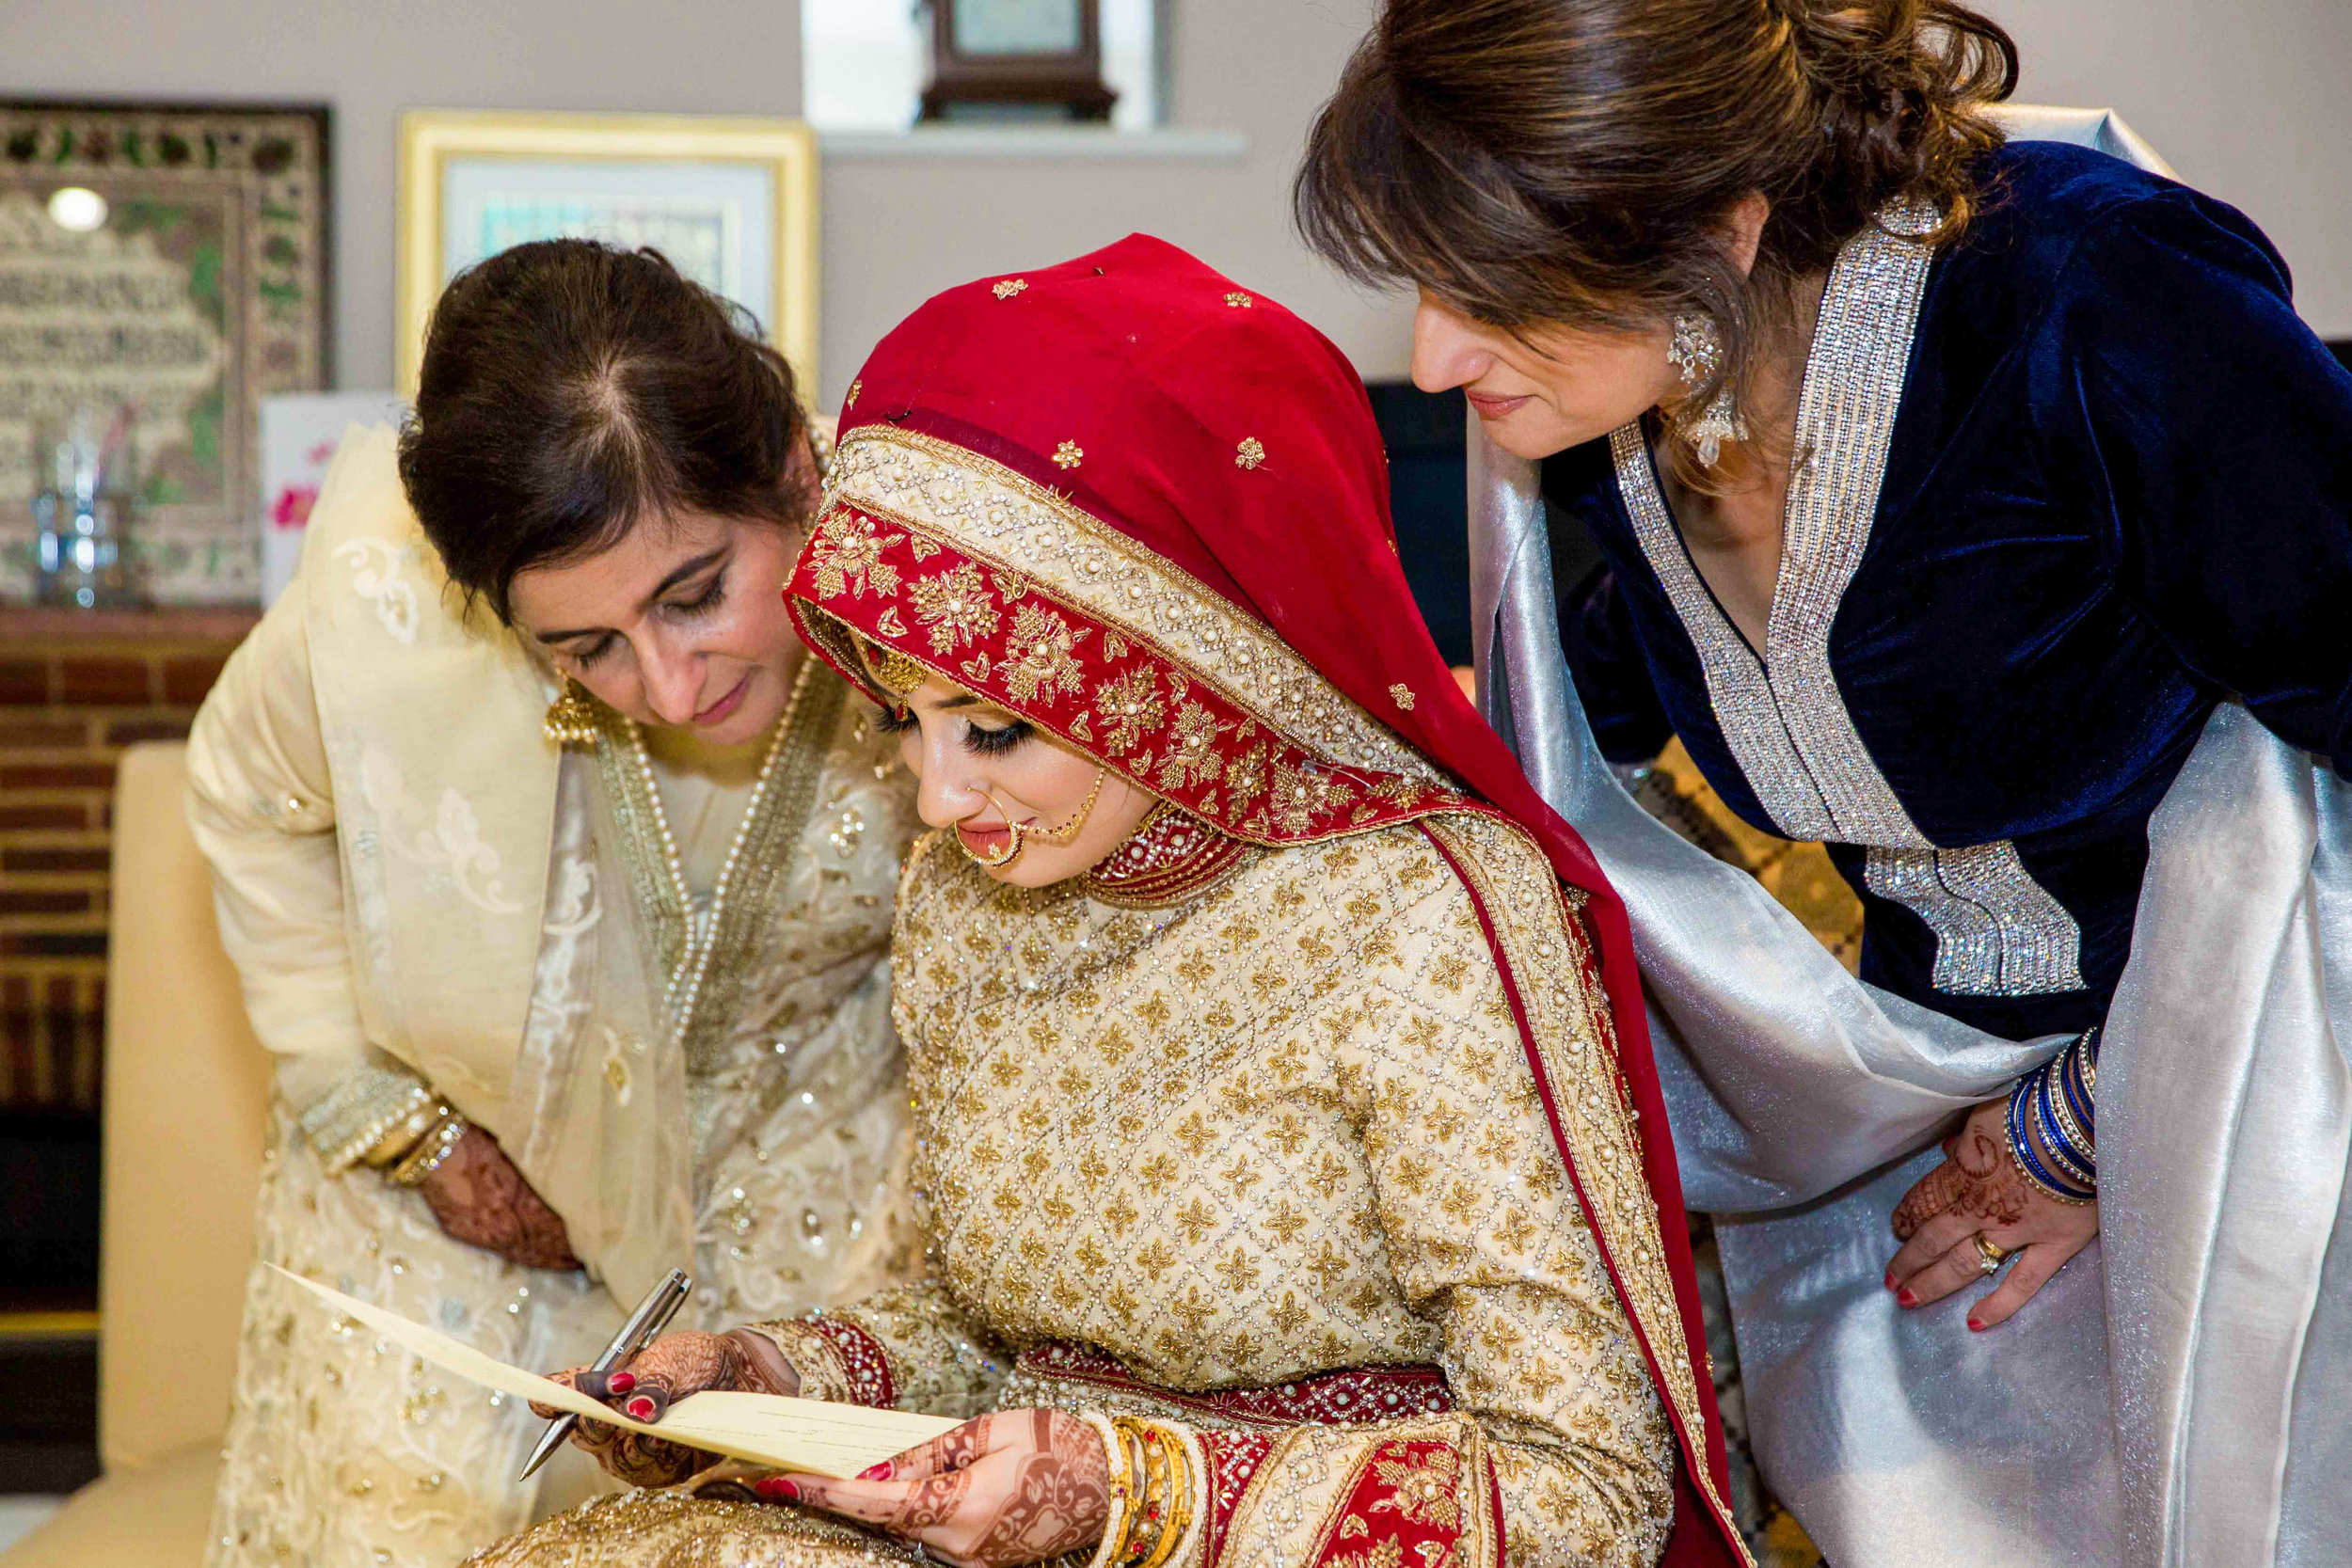 Macdonald-Berystede-Hotel-wedding-female-asian-wedding-photographer-london-natalia-smith-photography-60-2.jpg